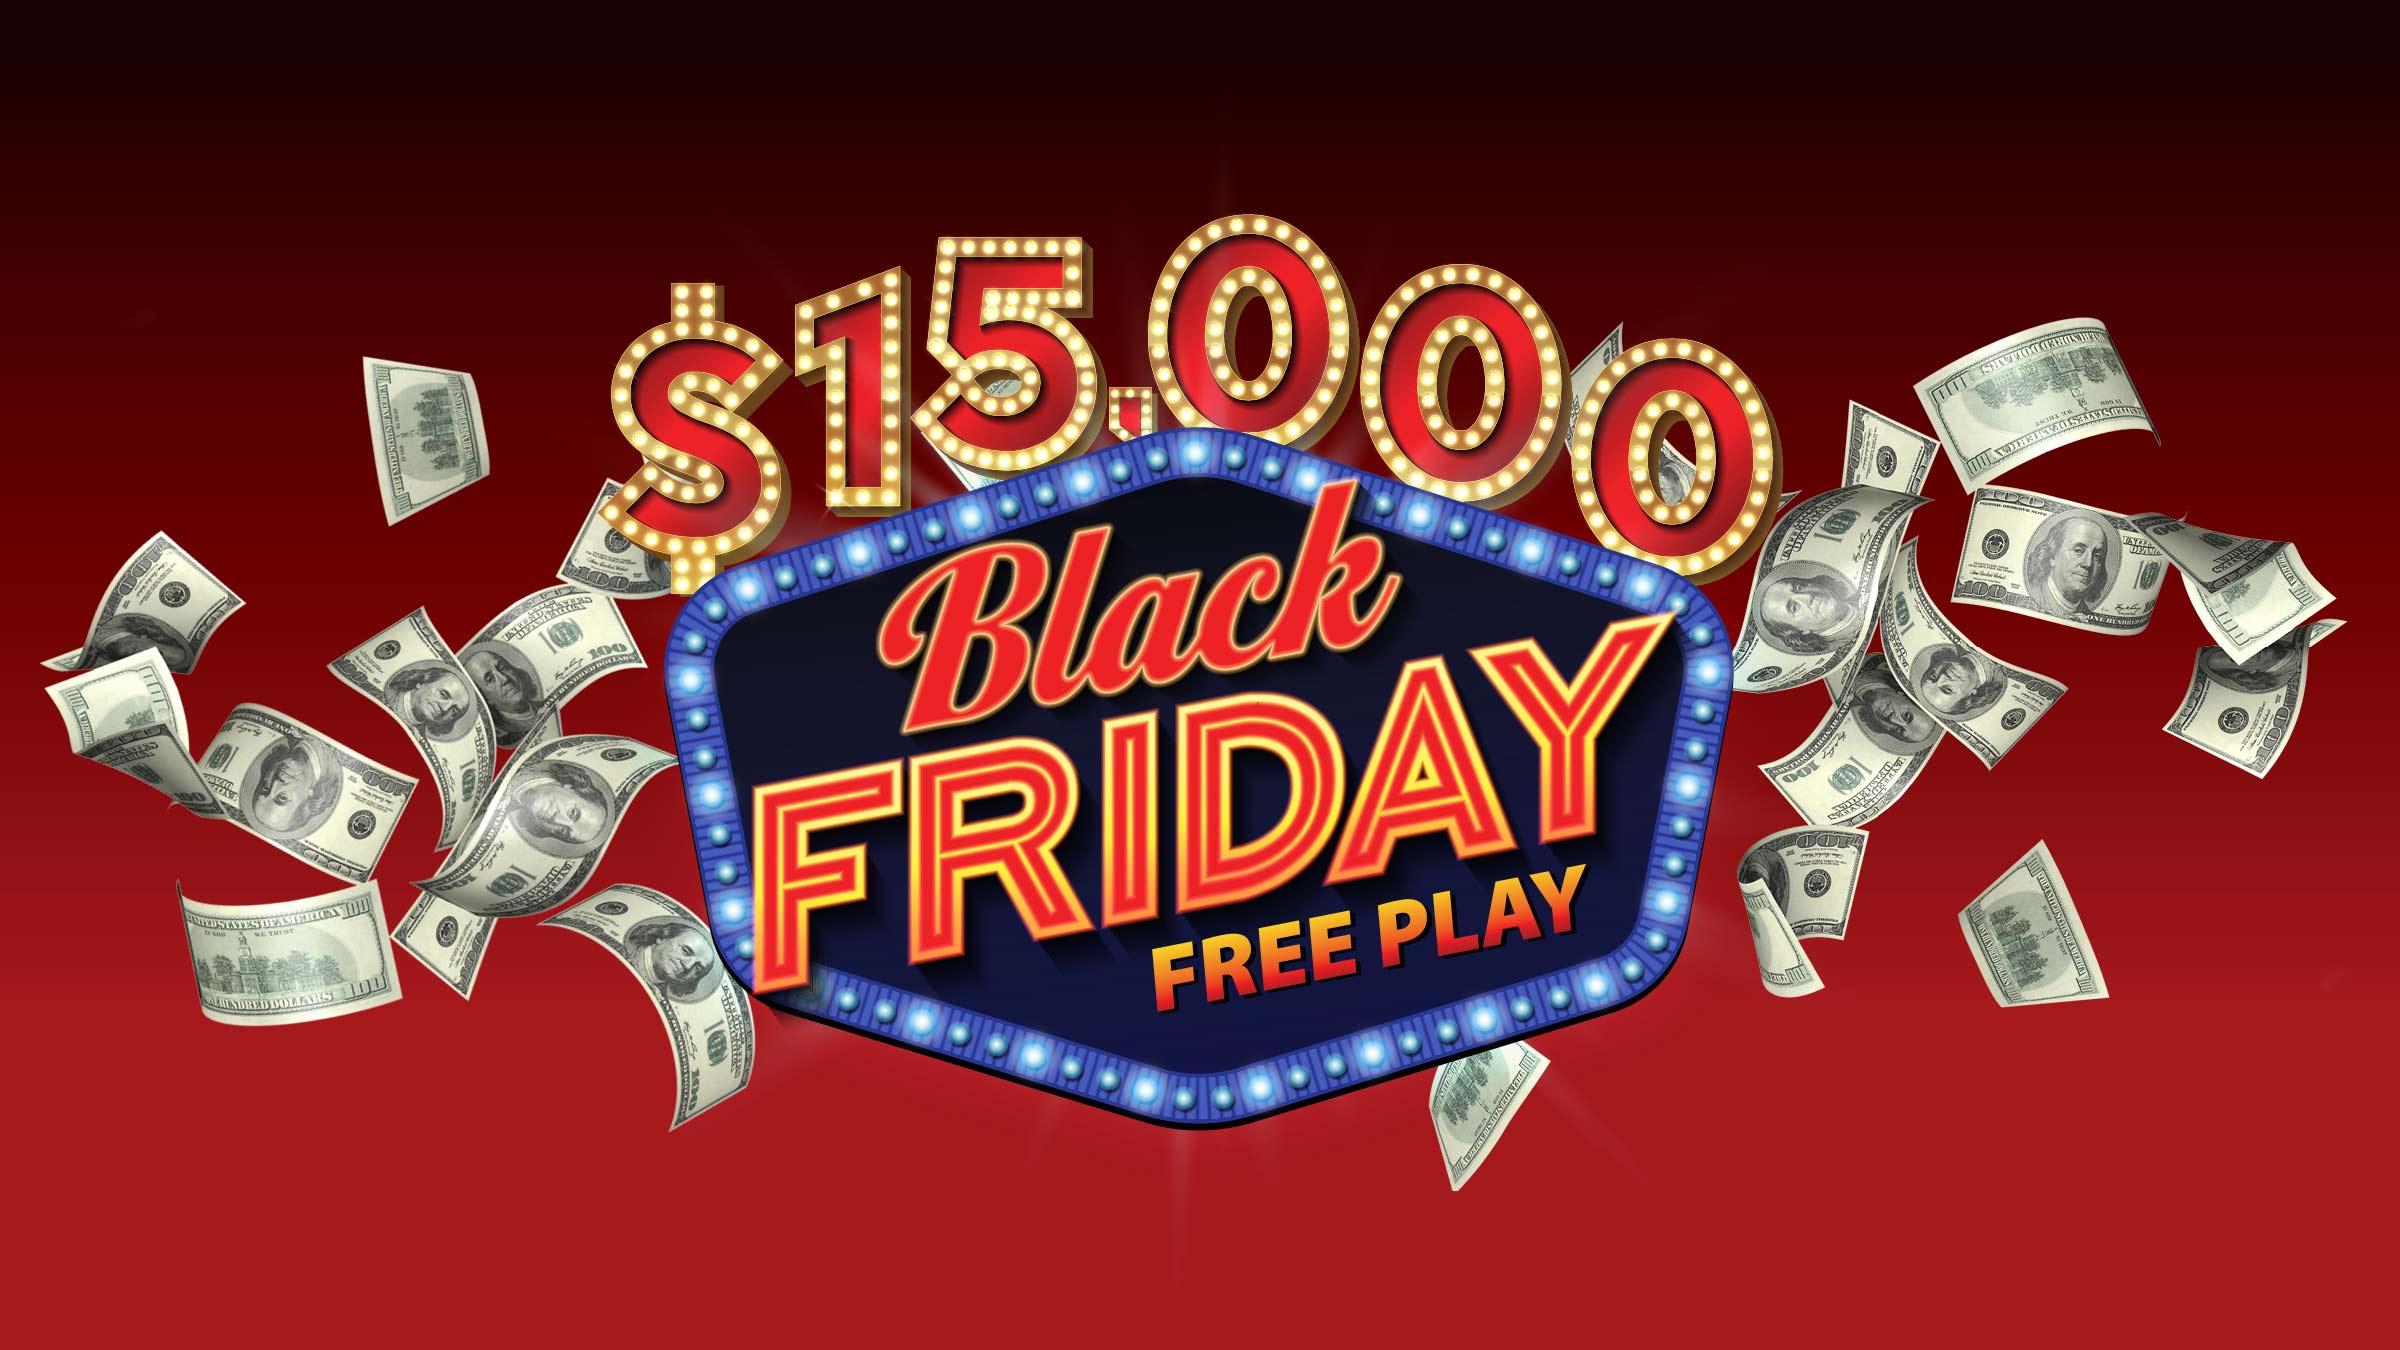 $15,000 Black Friday Free Play